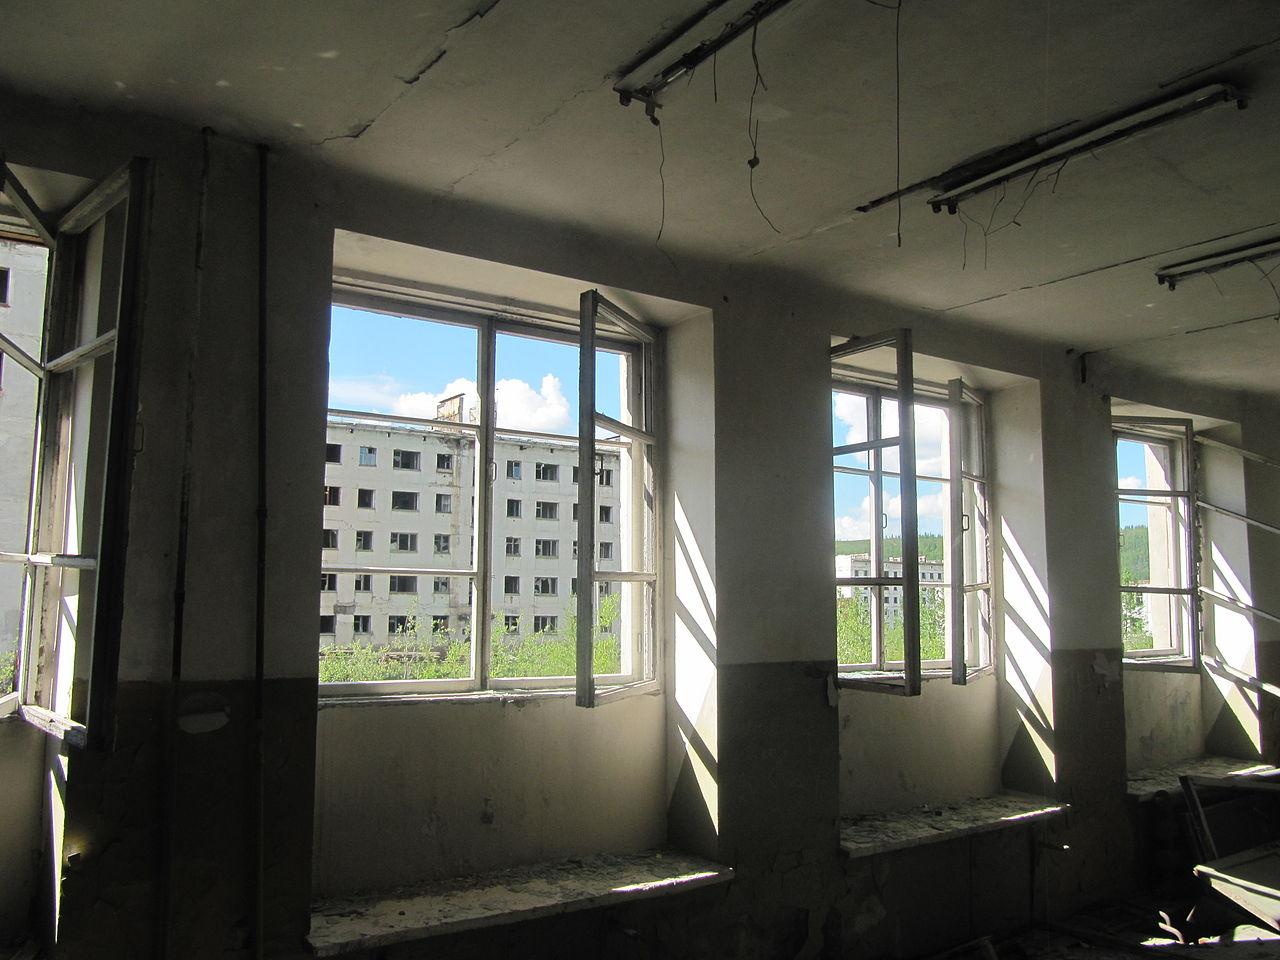 Classroom window - File Laika Ac Classroom Windows 6480331293 Jpg